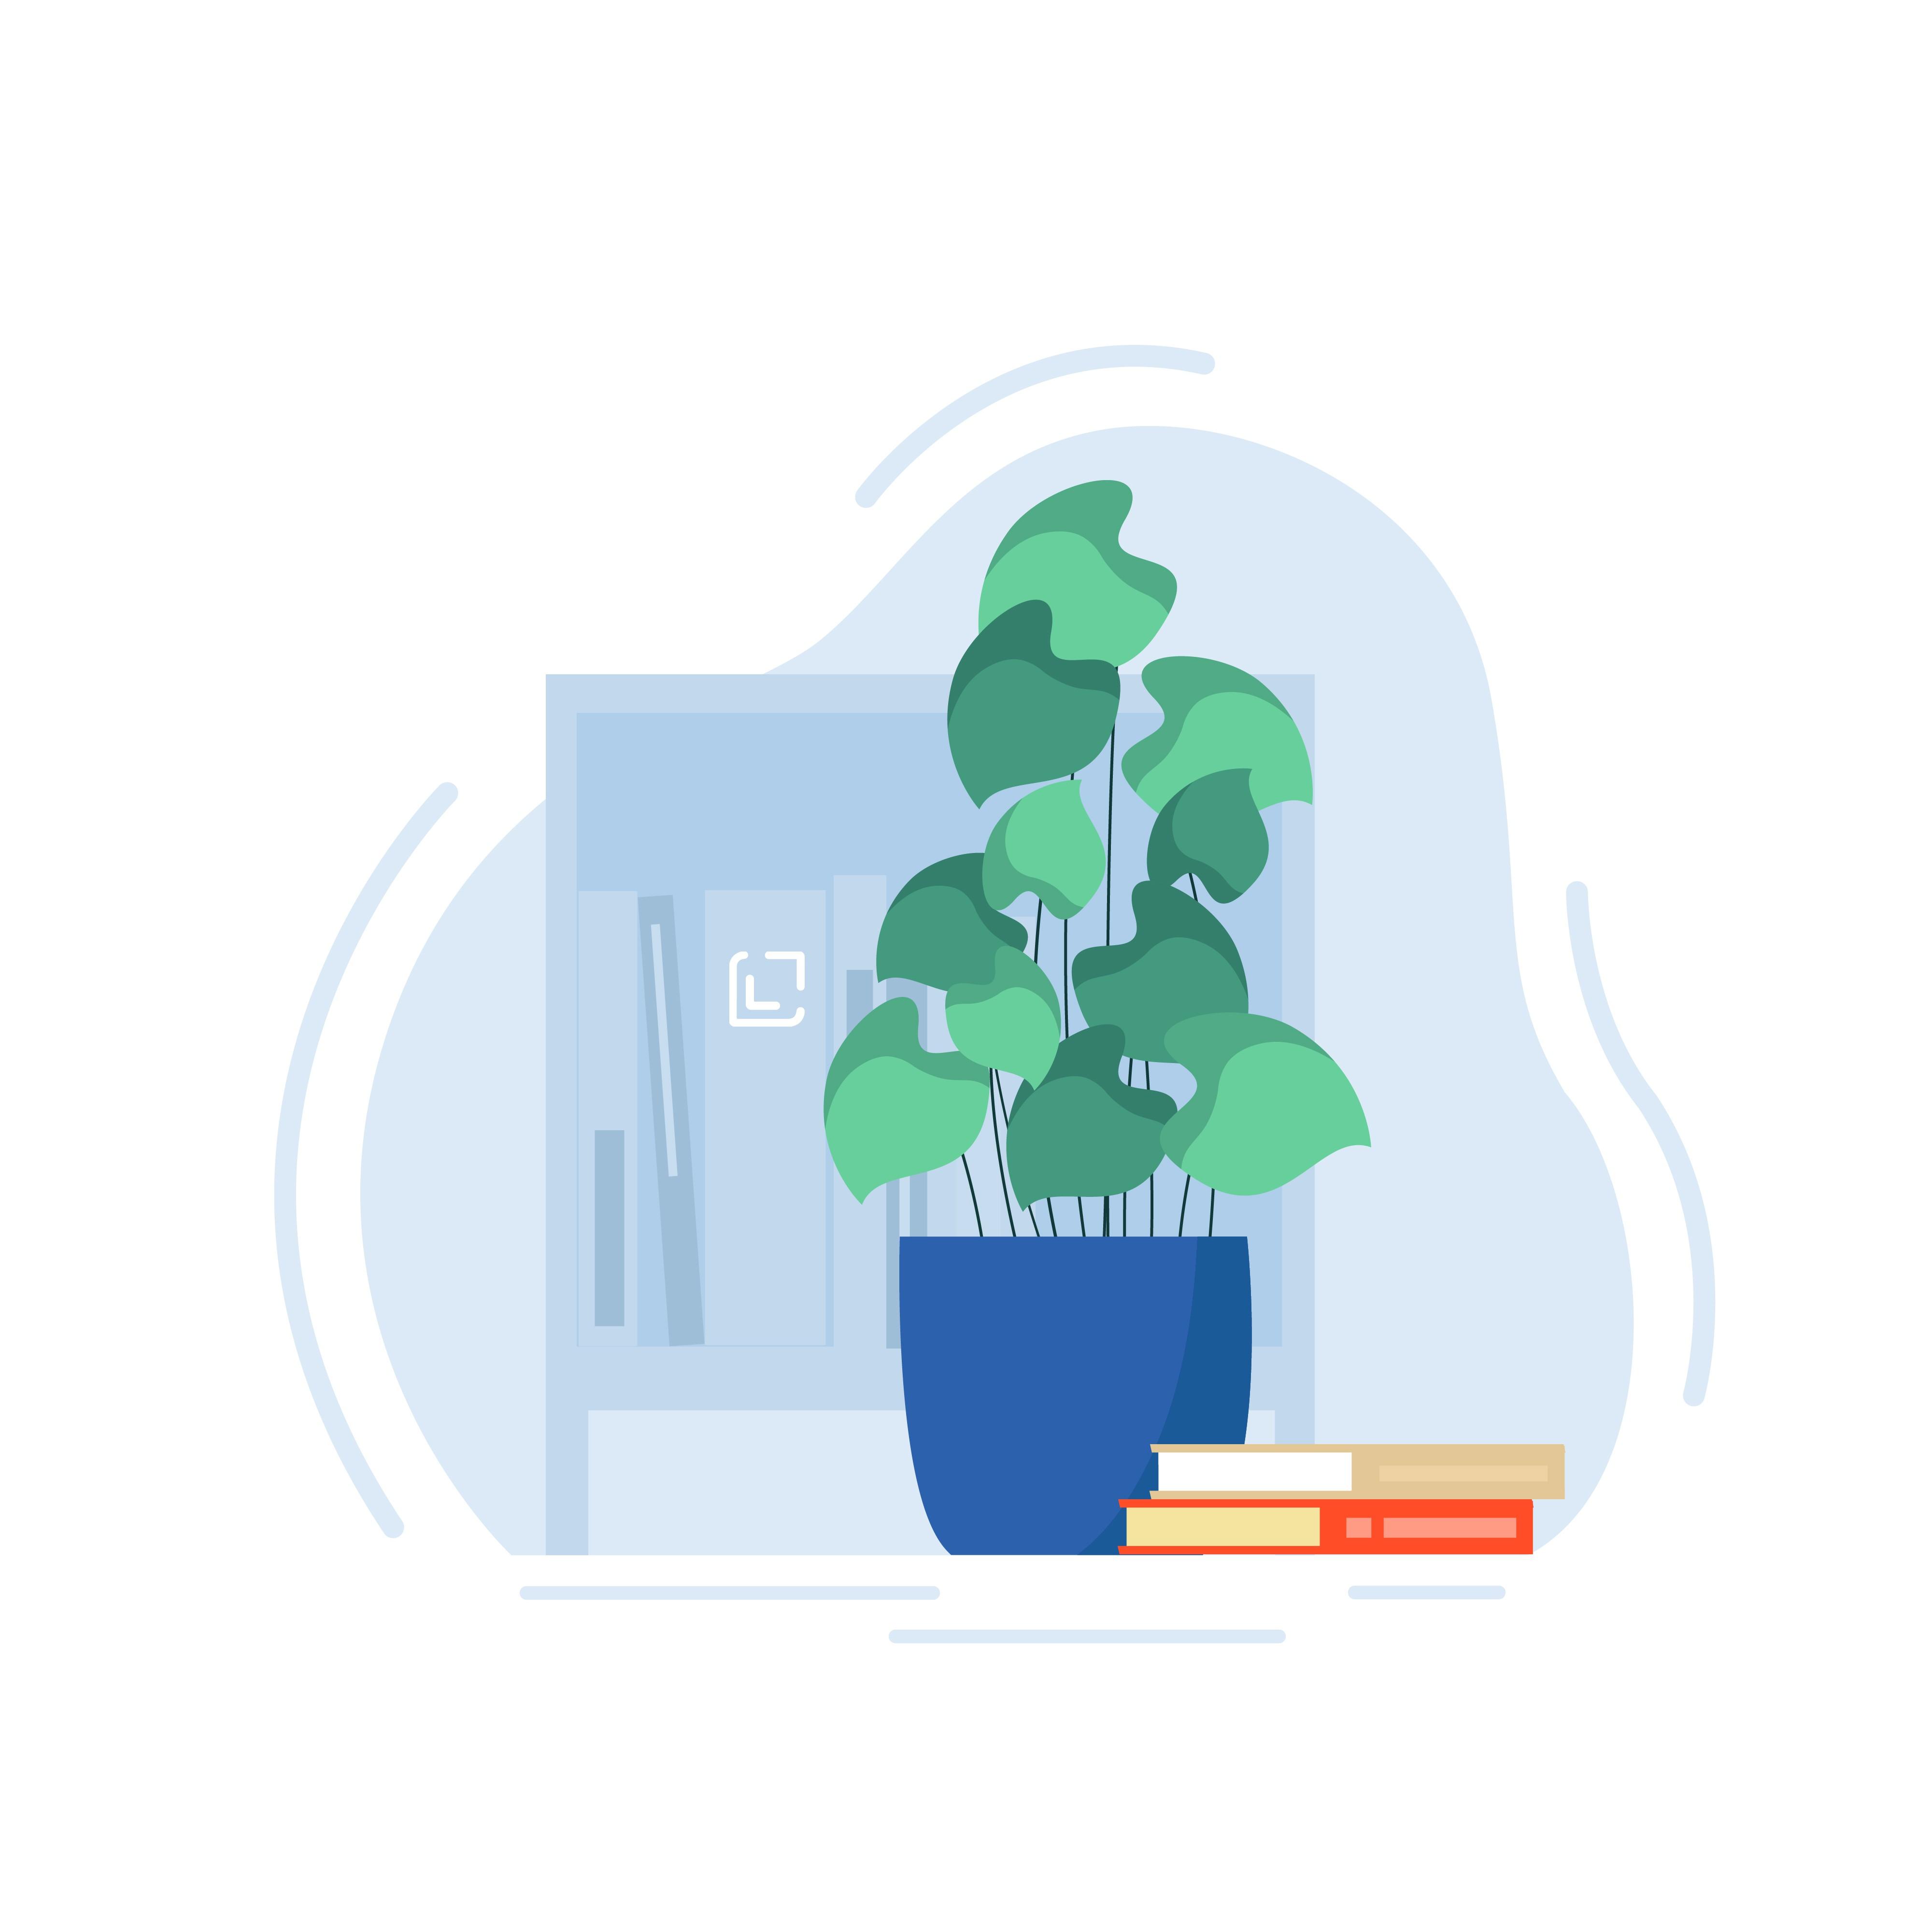 Design landing page illustration for mentoring non-profit for students